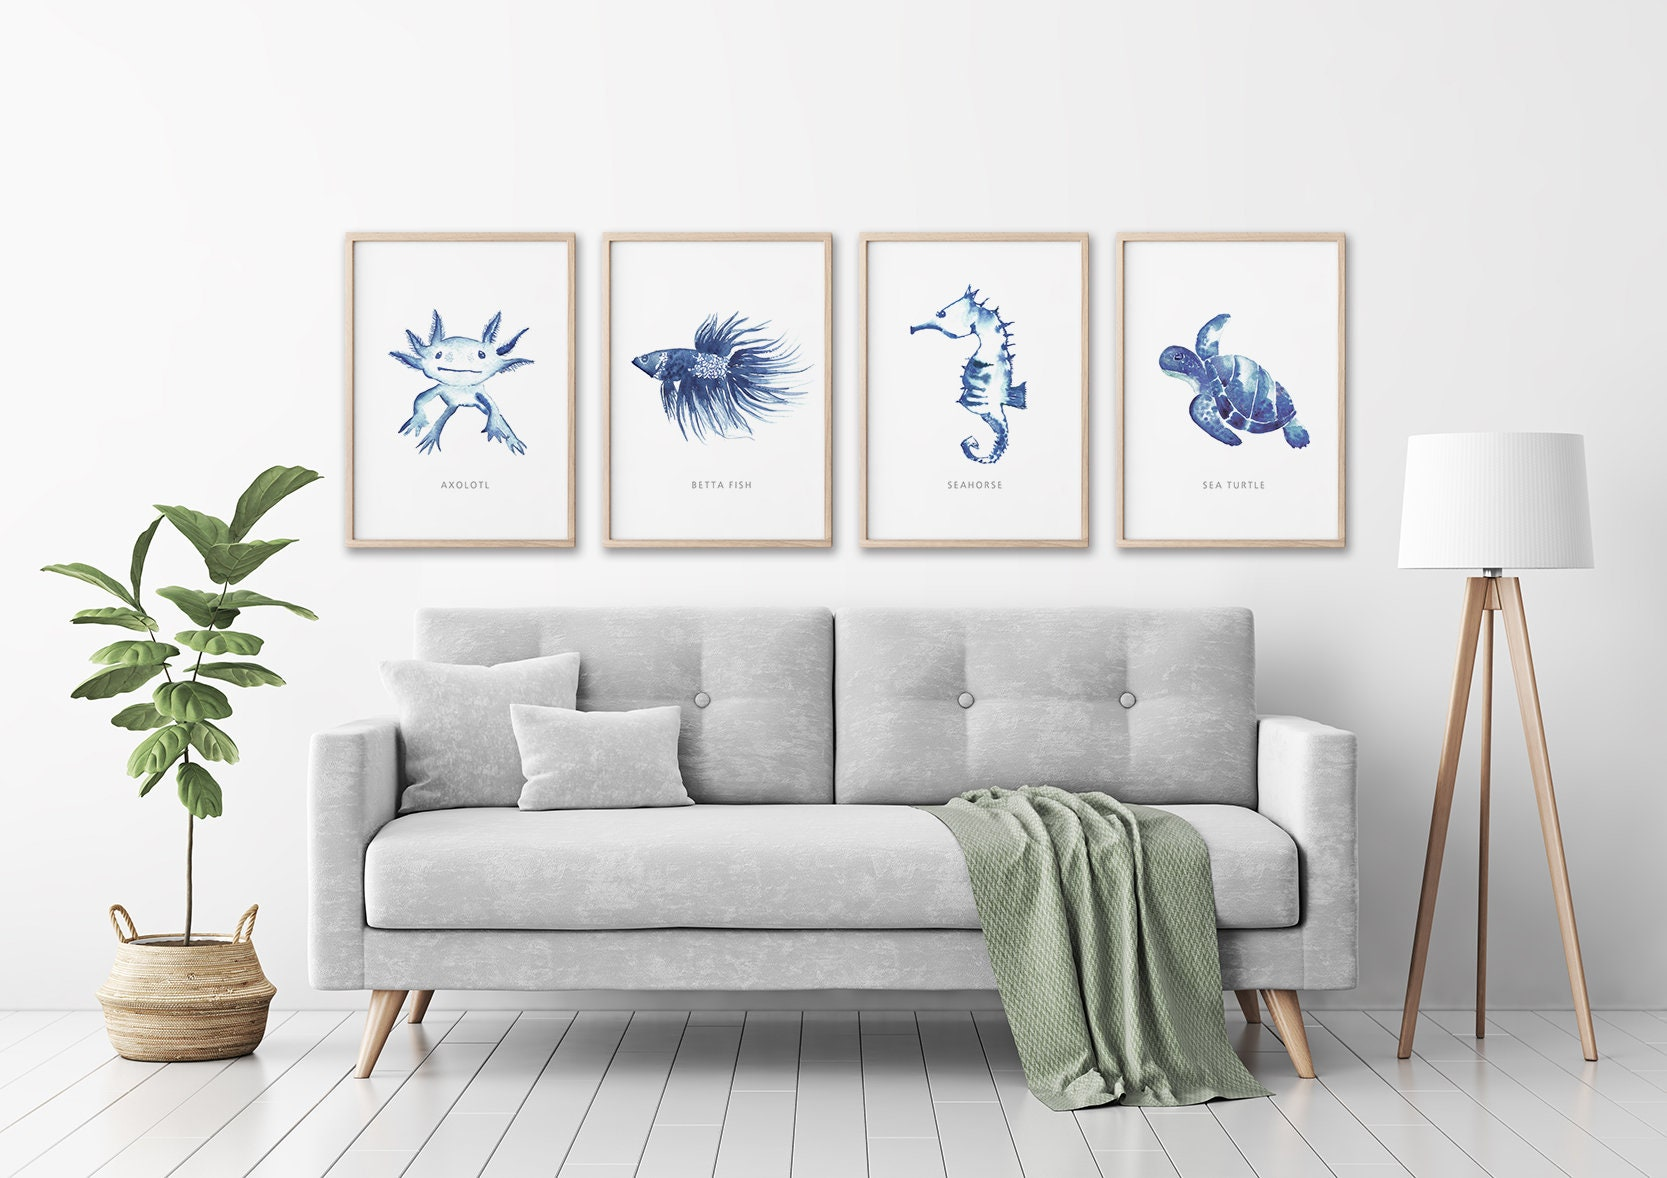 Amazing Betta Fish Wedding Centerpieces Ideas - Wedding Idea 2018 ...